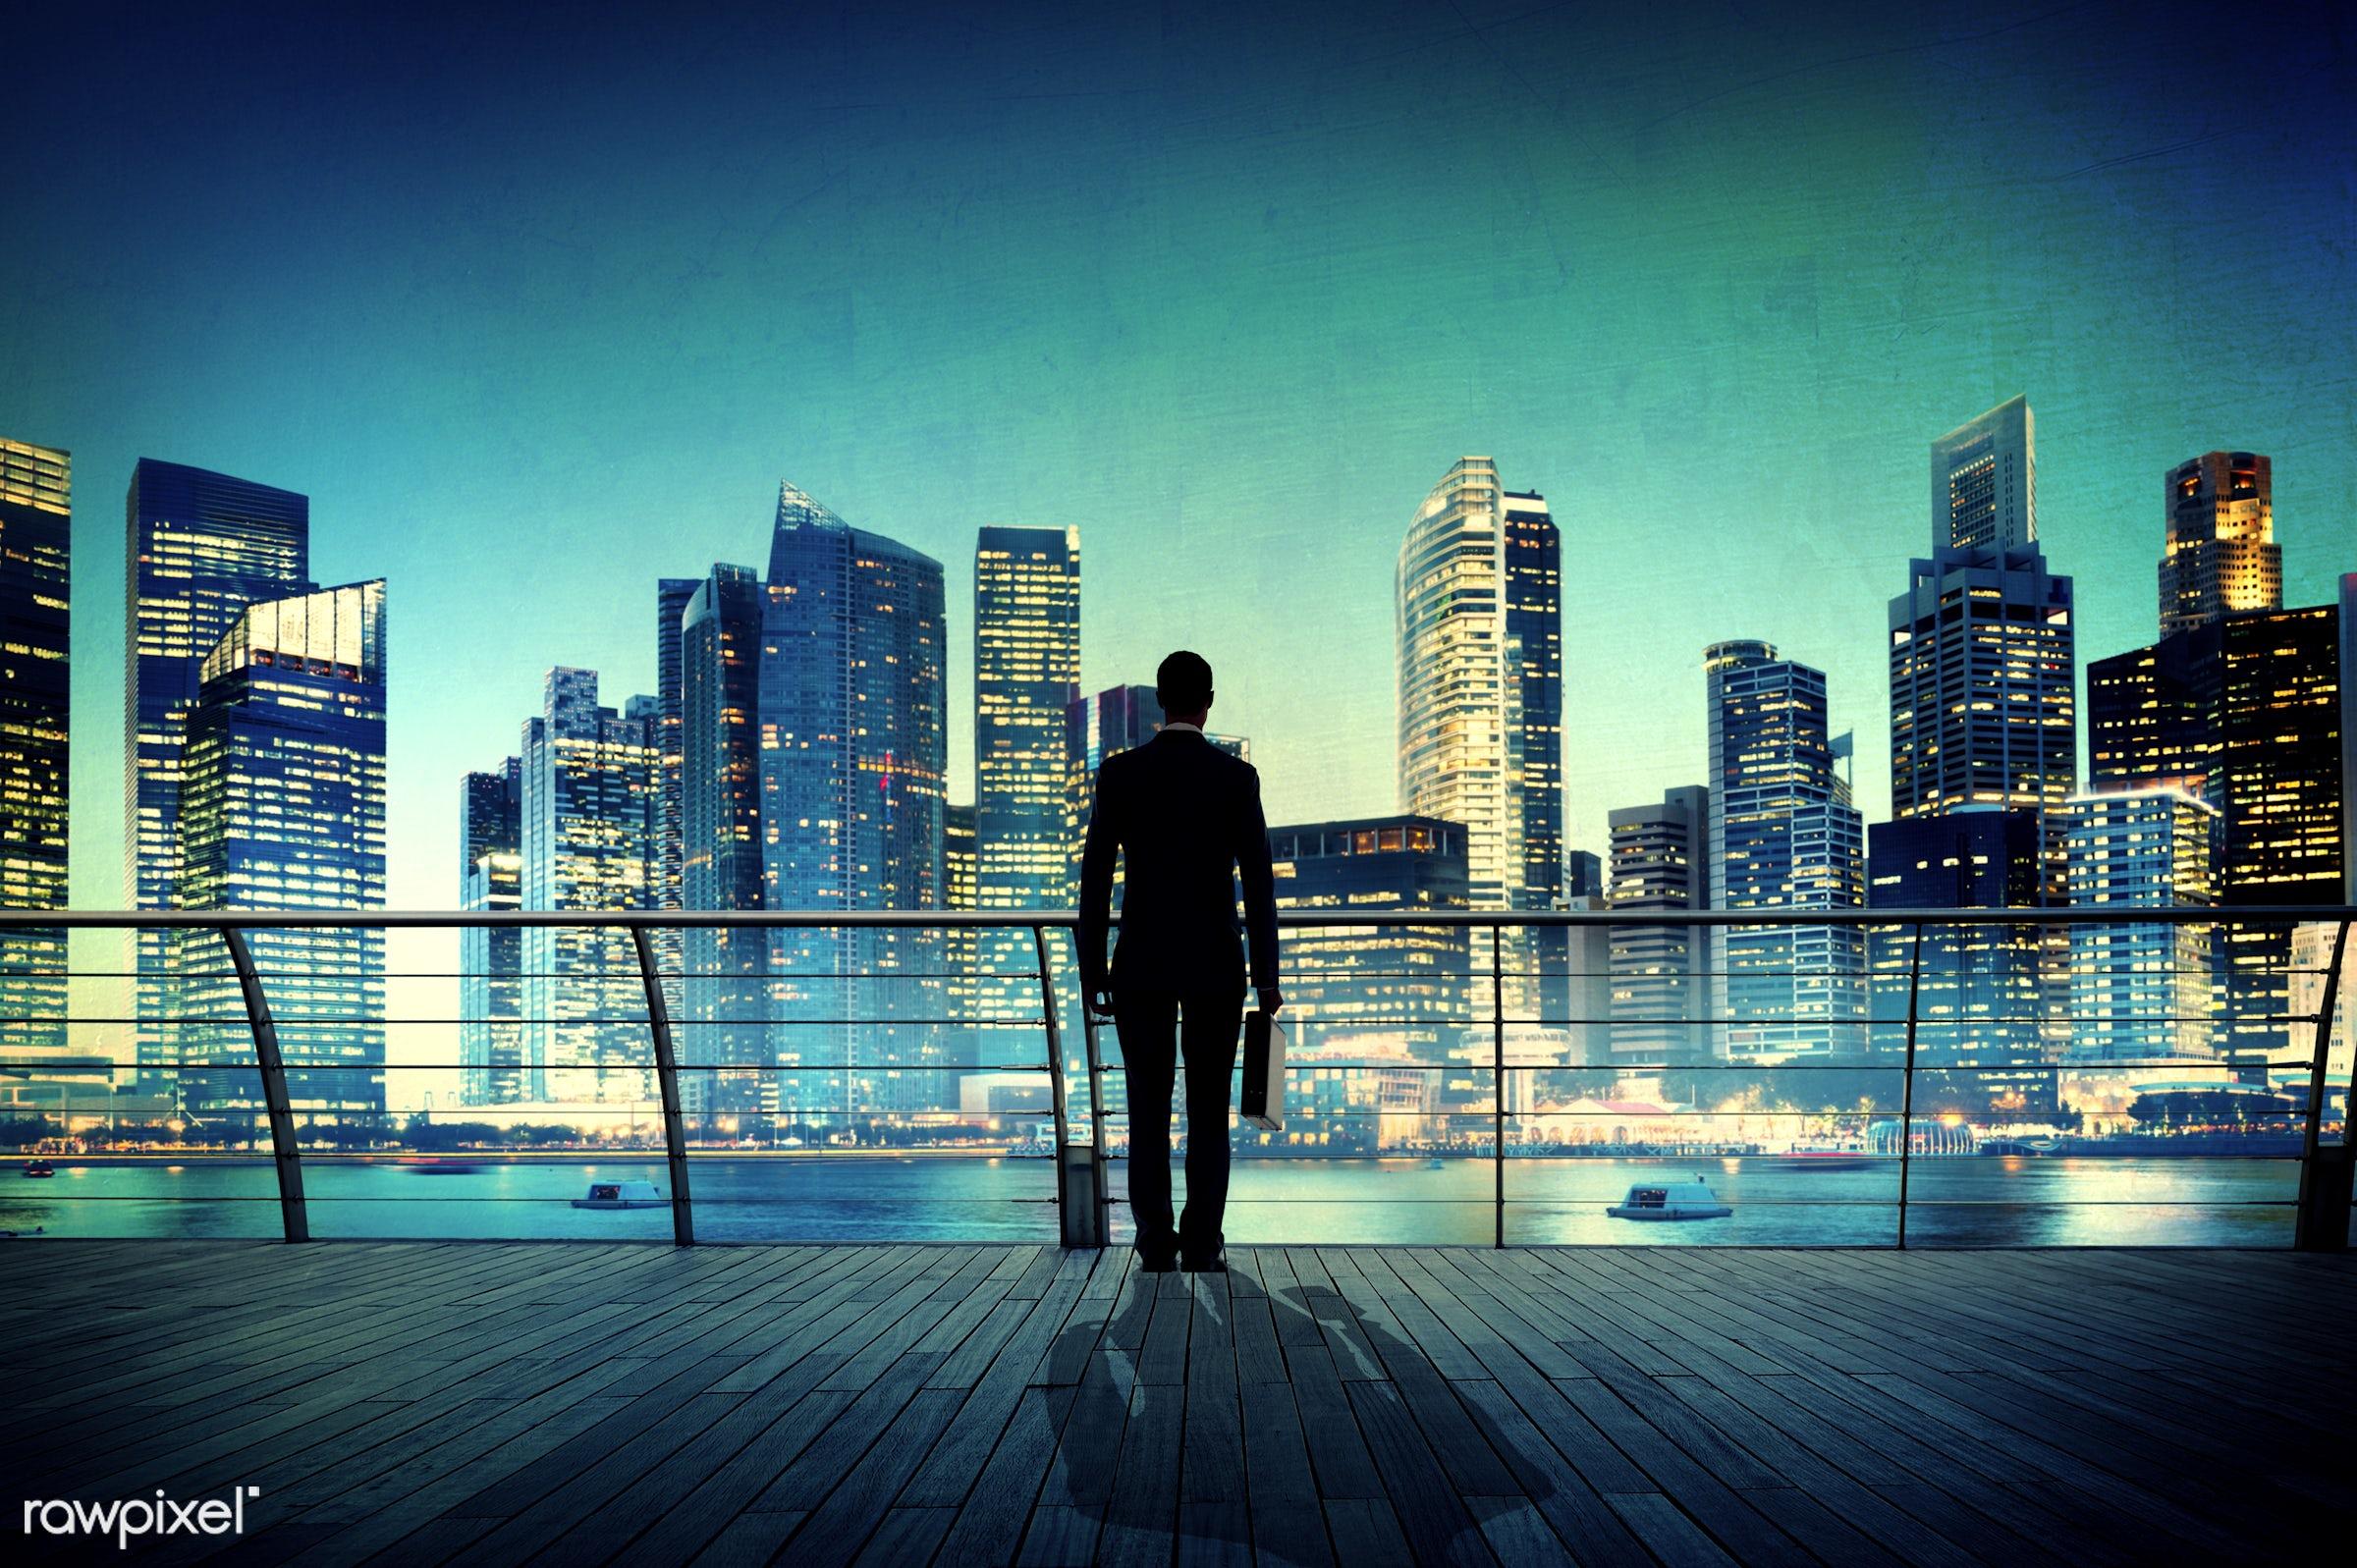 alone, back lit, boat, briefcase, building, business, businessman, city, city lights, cityscape, contemplation, deck, fence...